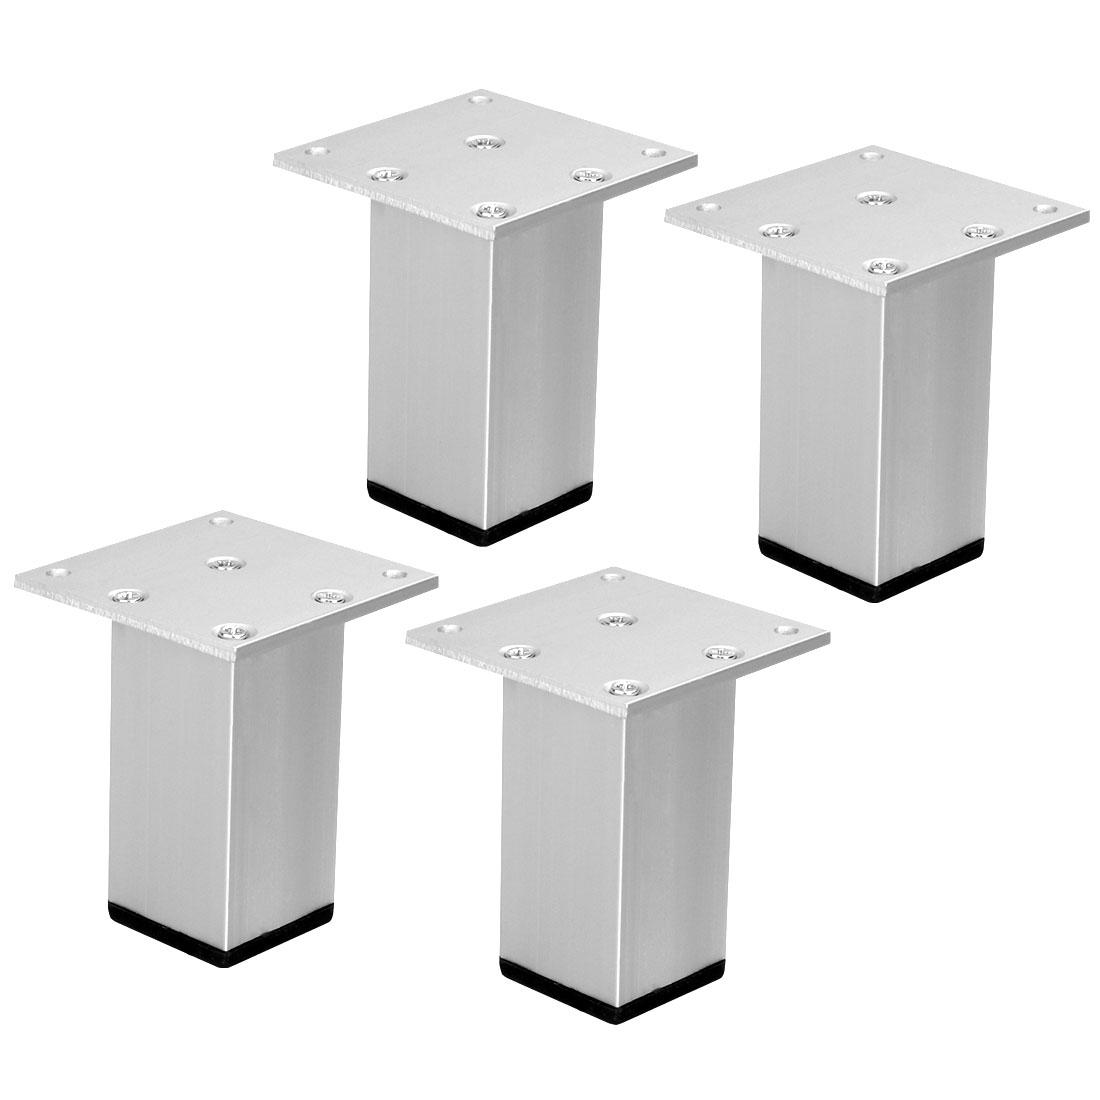 "3"" Furniture Legs Aluminium Alloy Table Feet Replacement Height Adjuster 4pcs"